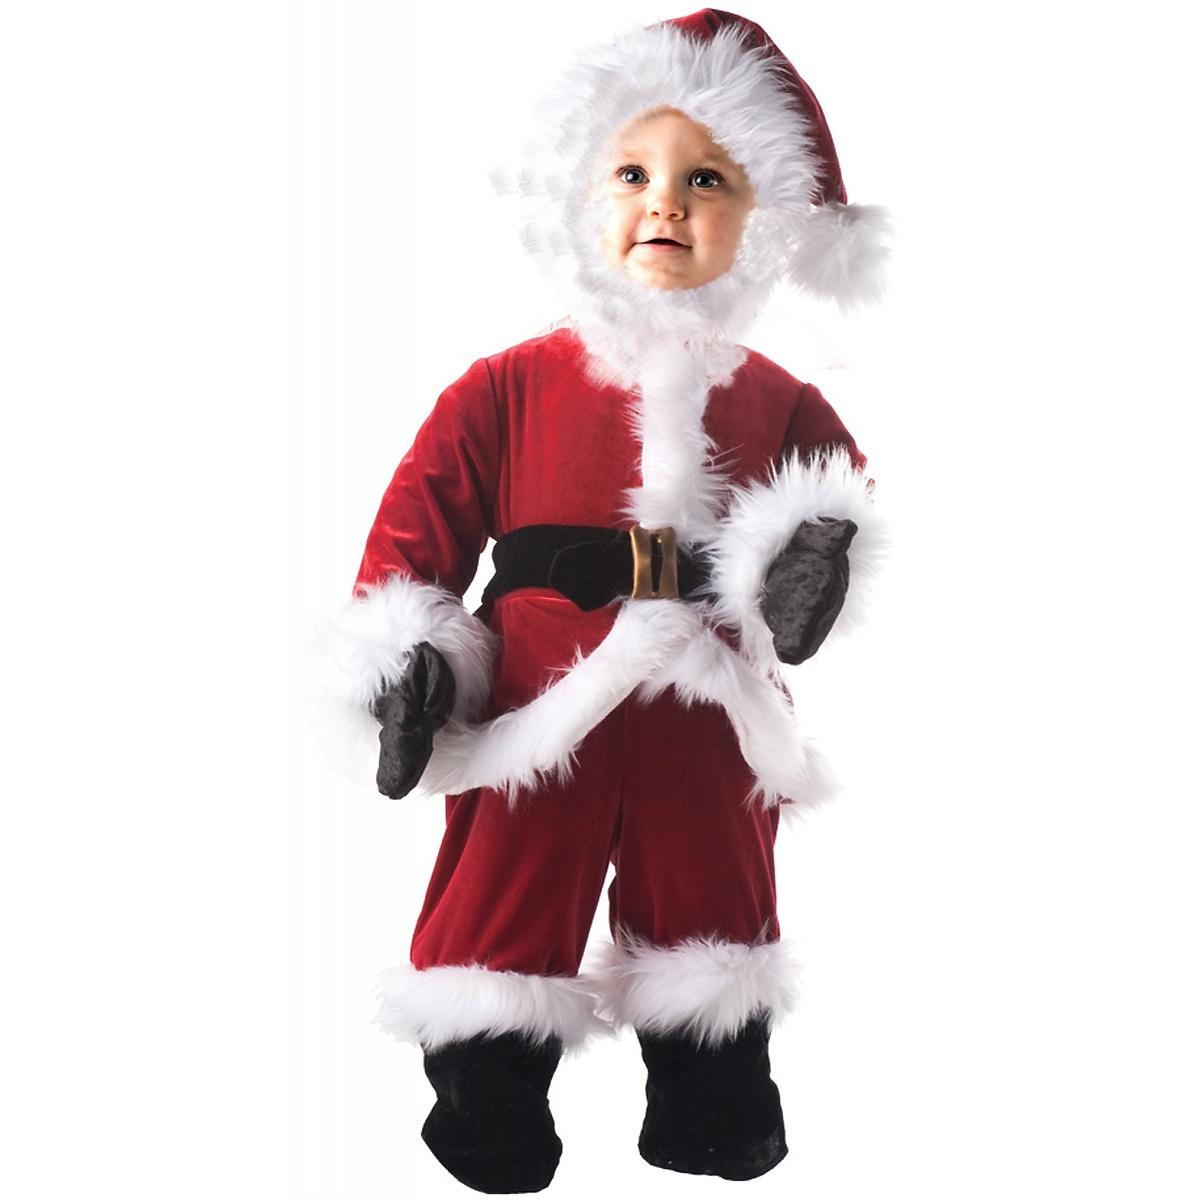 underwraps baby santa outfit infanttoddlerkids christmas costume fancy dress